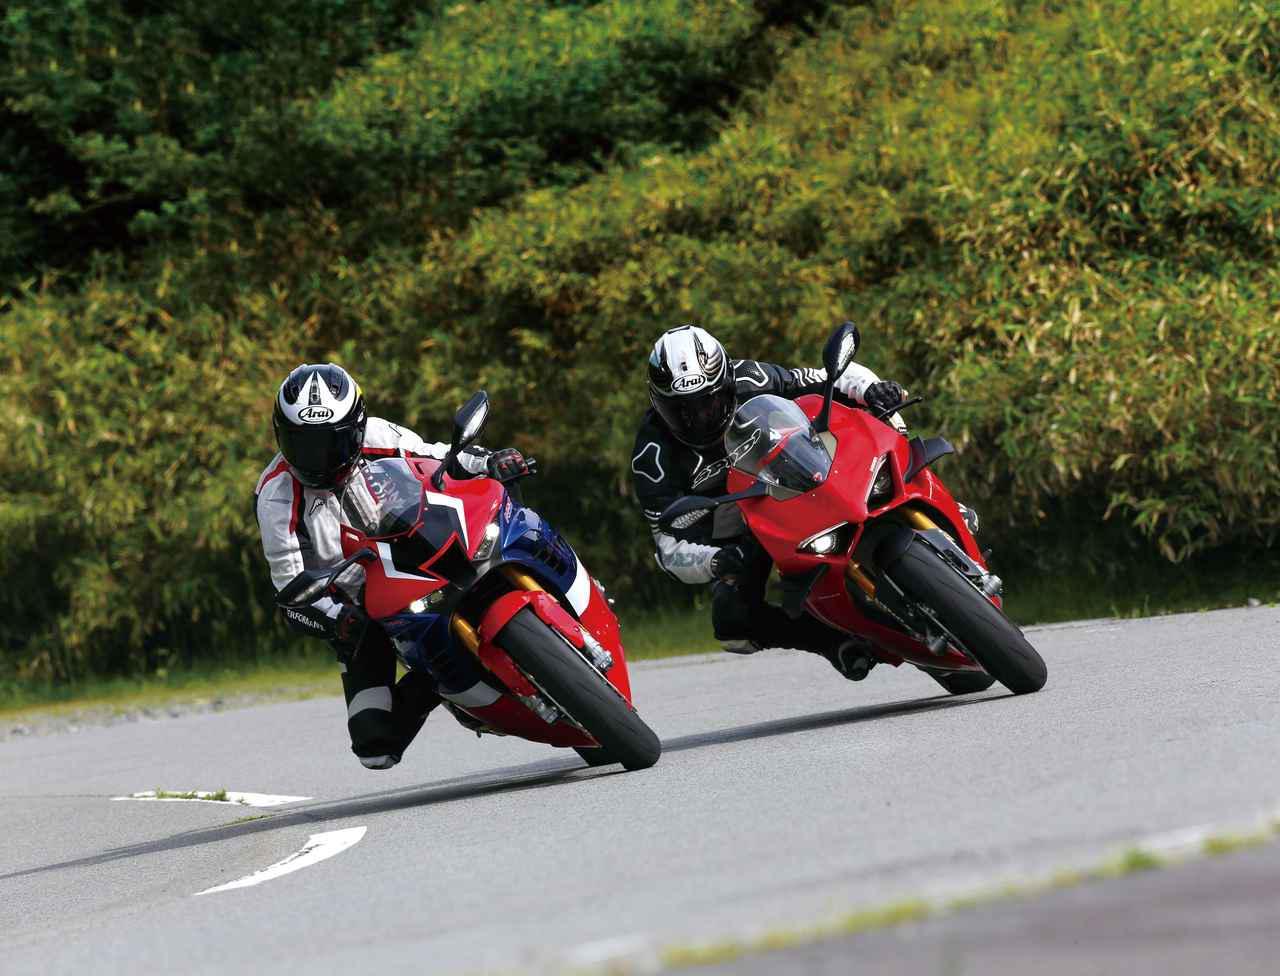 画像1: (左)Honda CBR1000RR-R FIREBLADE SP (右)DUCATI PANIGALE V4S